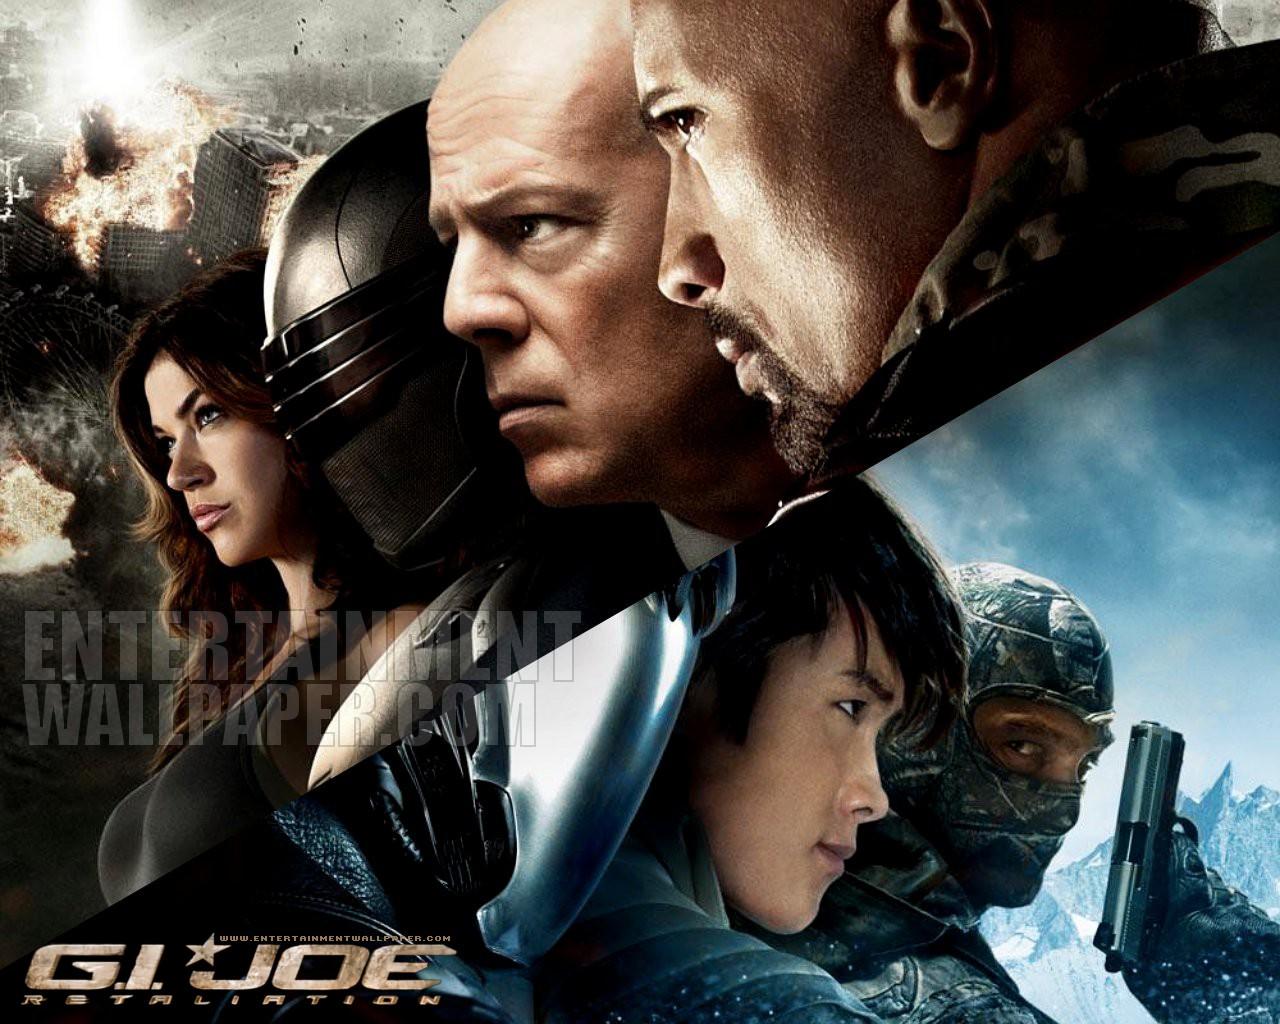 g i joe retaliation 2013 movie free download 720p bluray - movie area